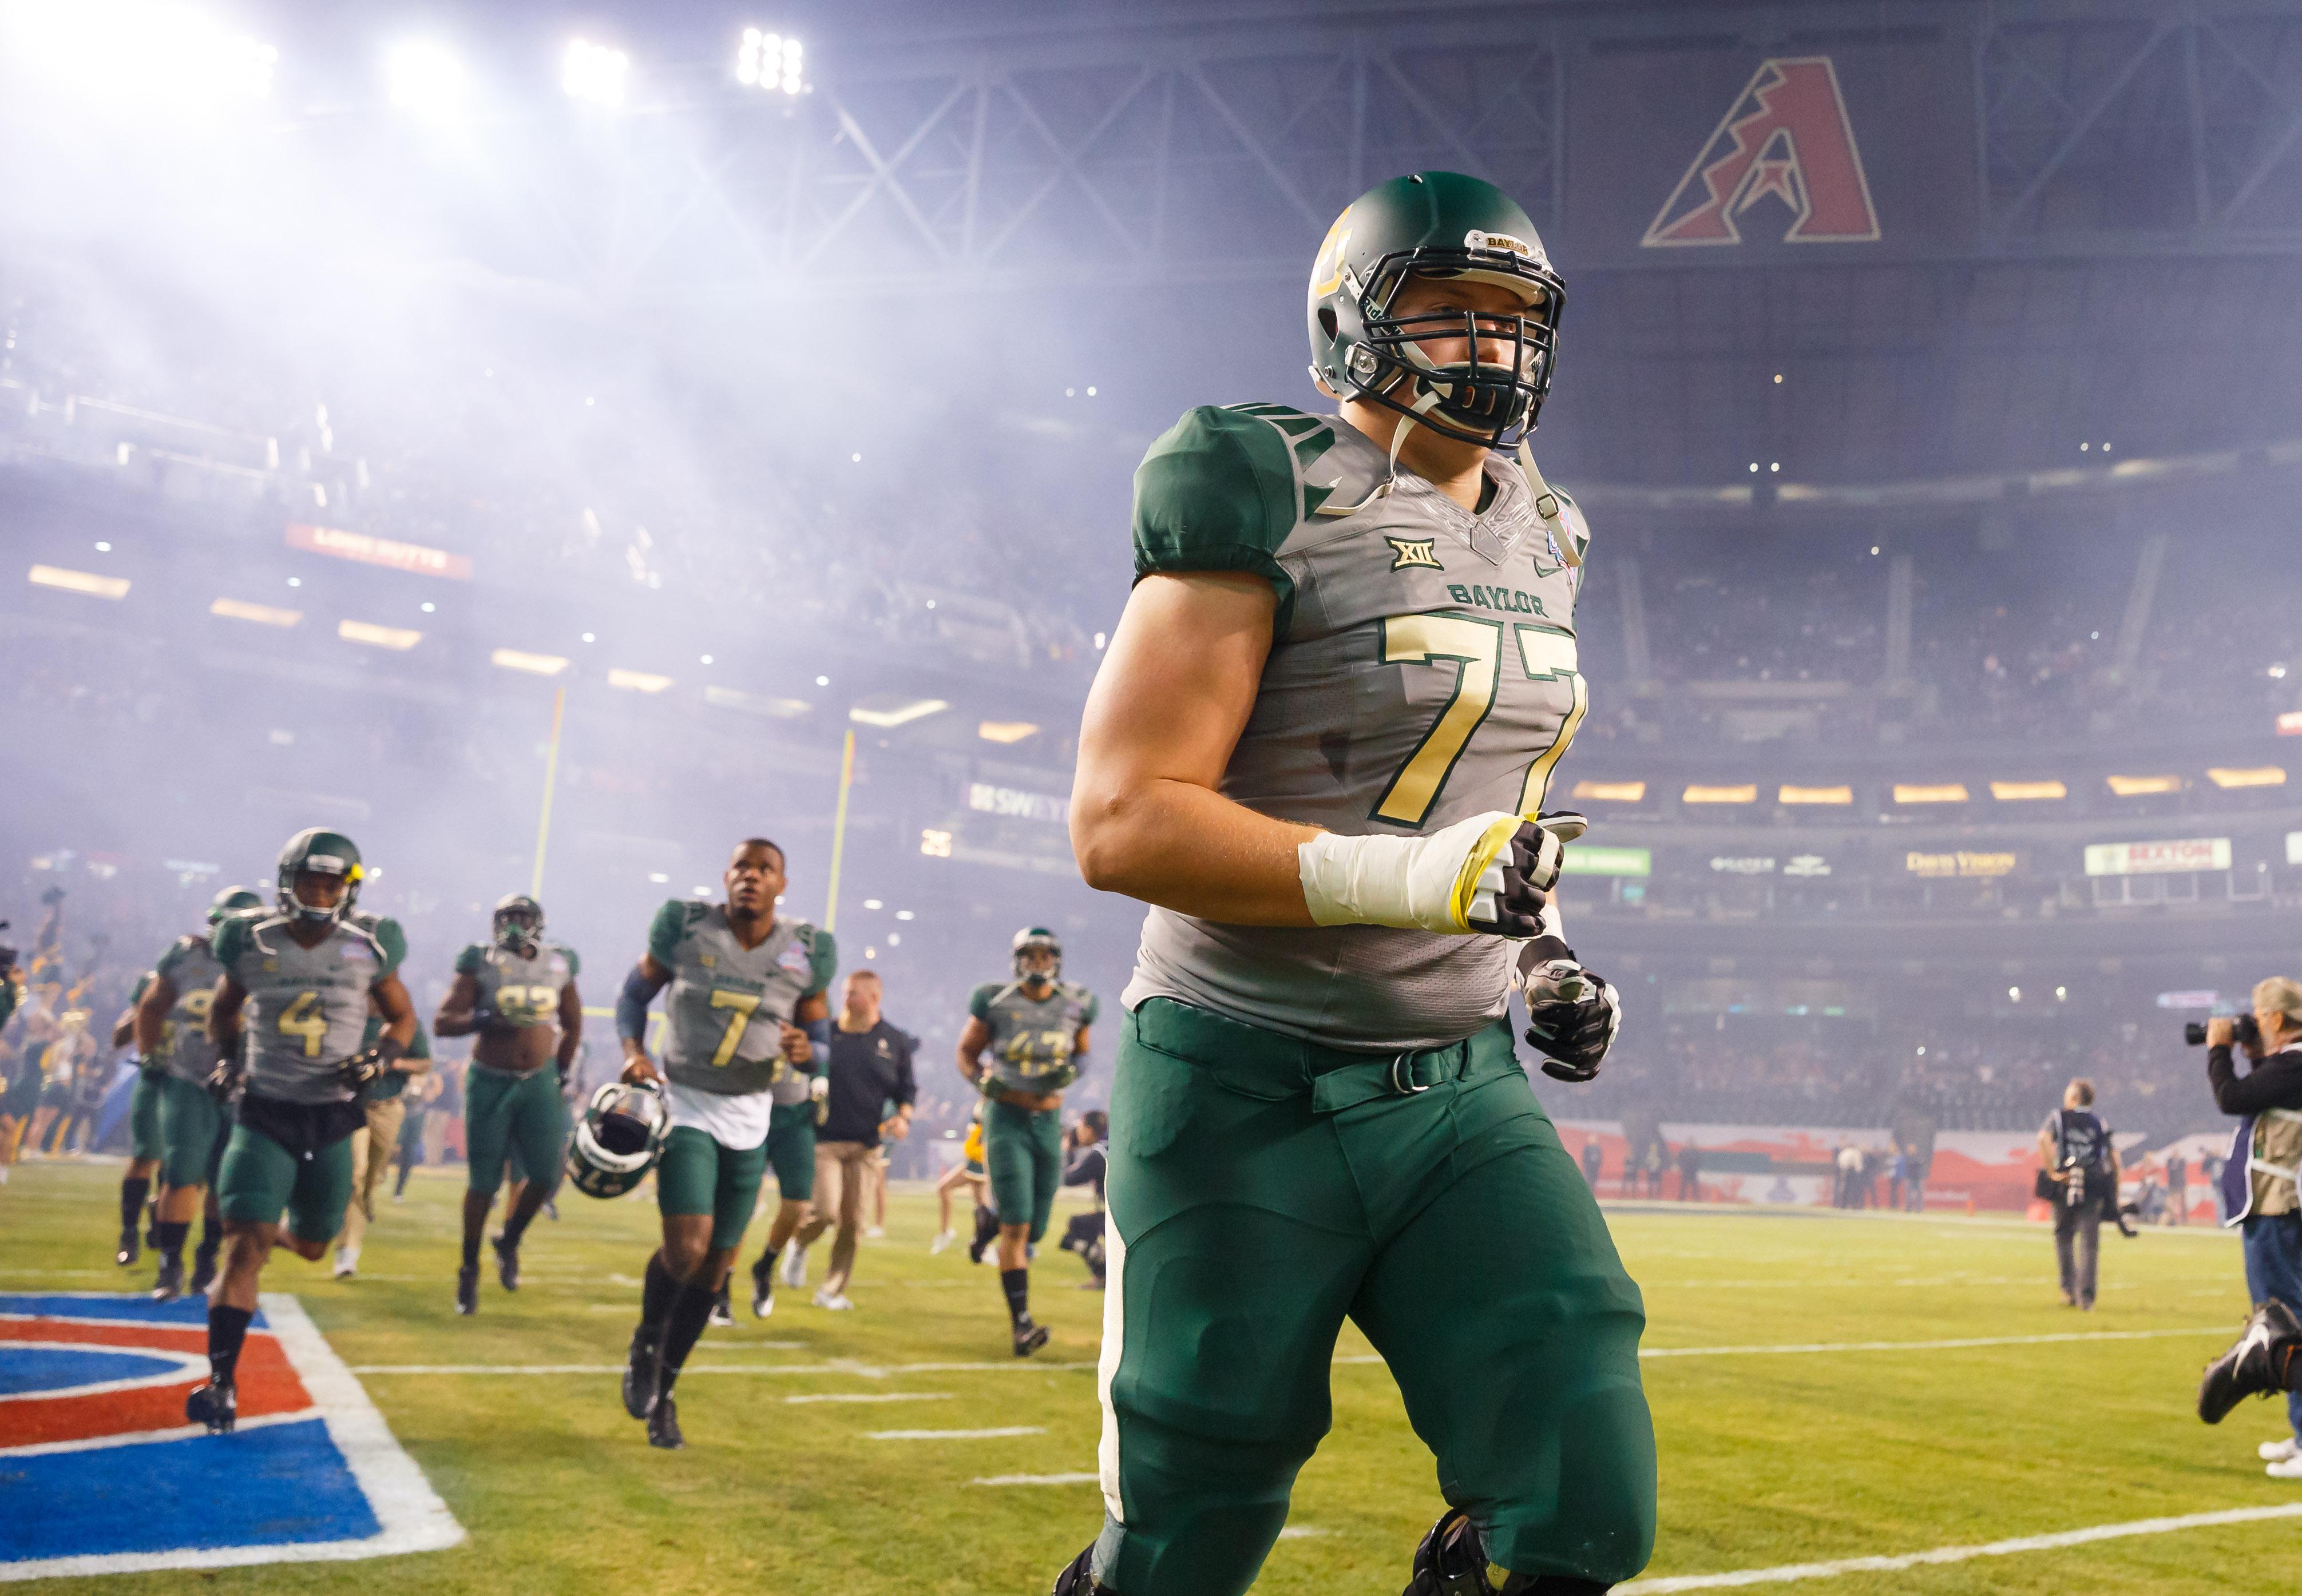 NCAA Football: Cactus Bowl-Boise State vs Baylor